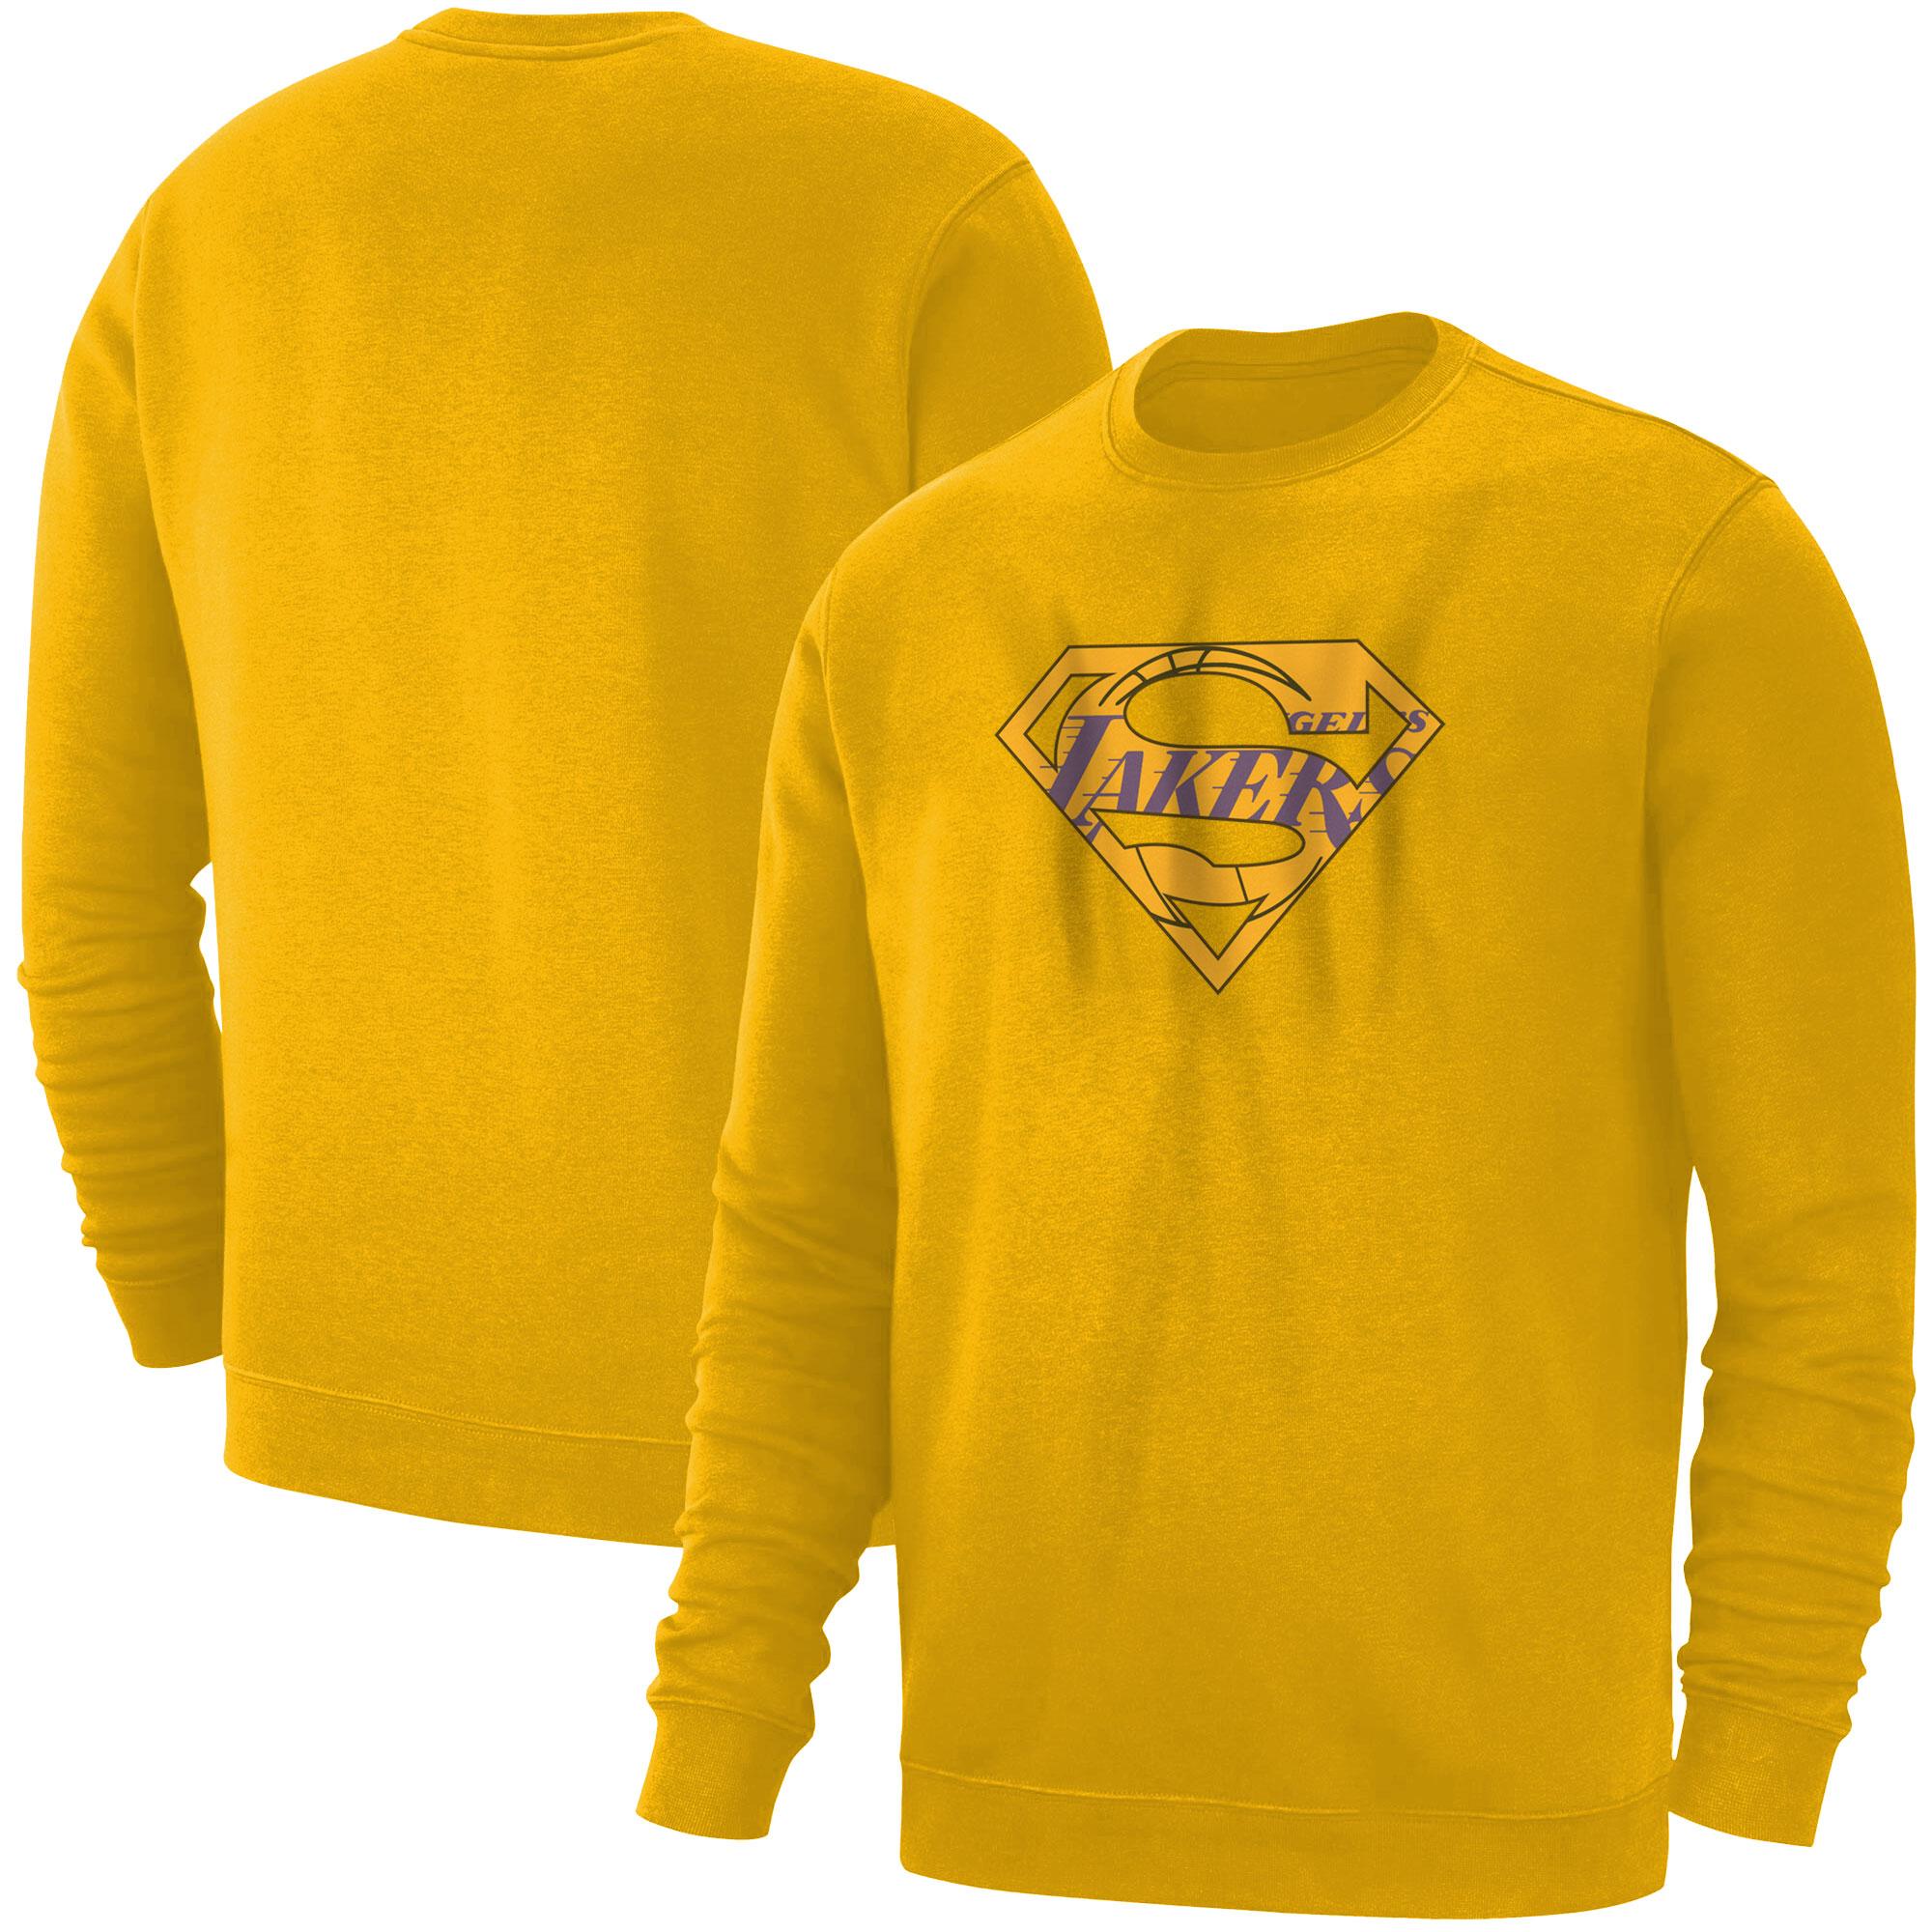 Lakers Superman  Basic (BSC-YLW-NP-122-NBA-LAL-SUPERMAN)